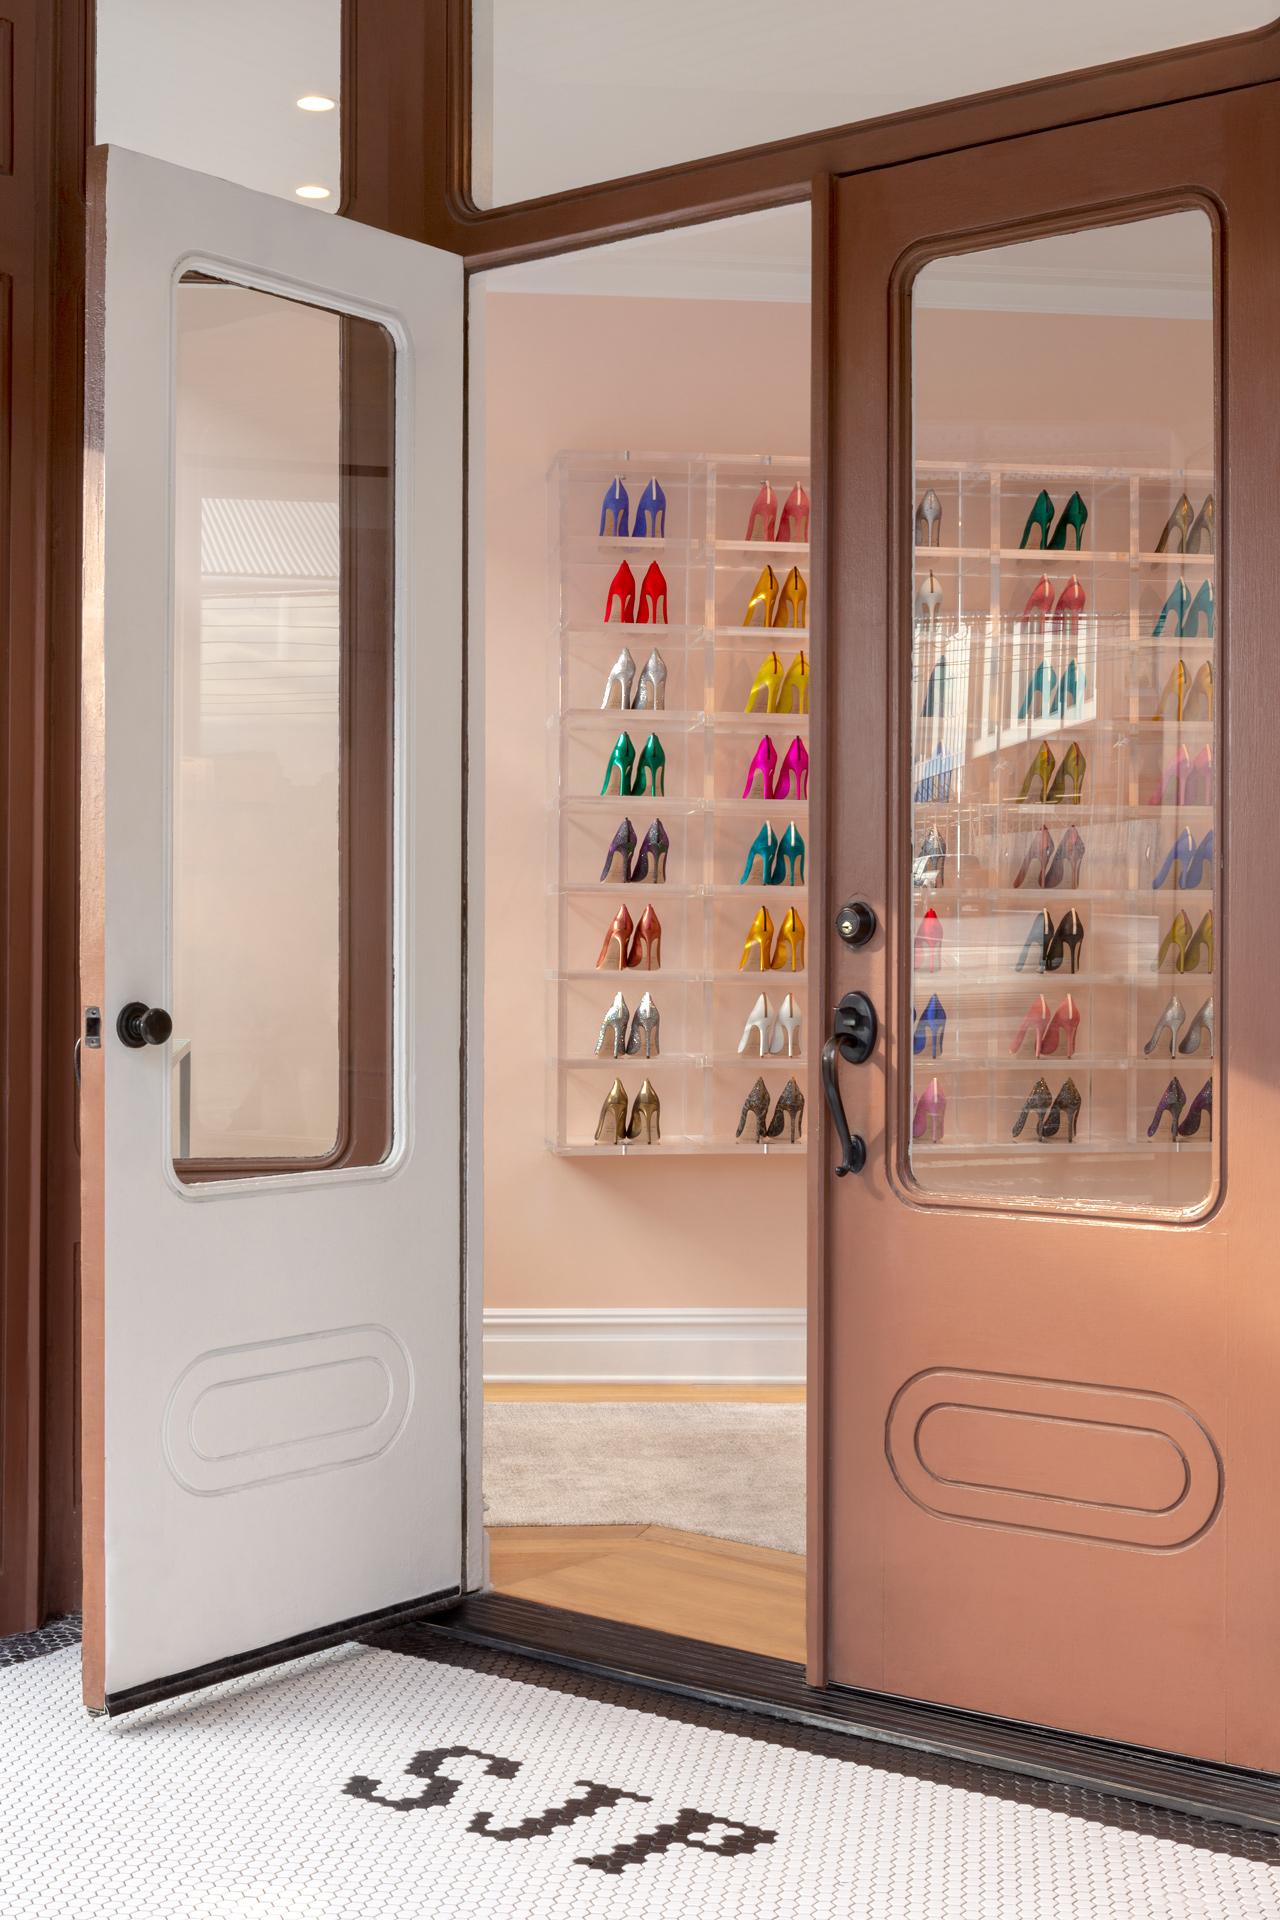 SJP by Sarah Jessica Parker retails store interiors design